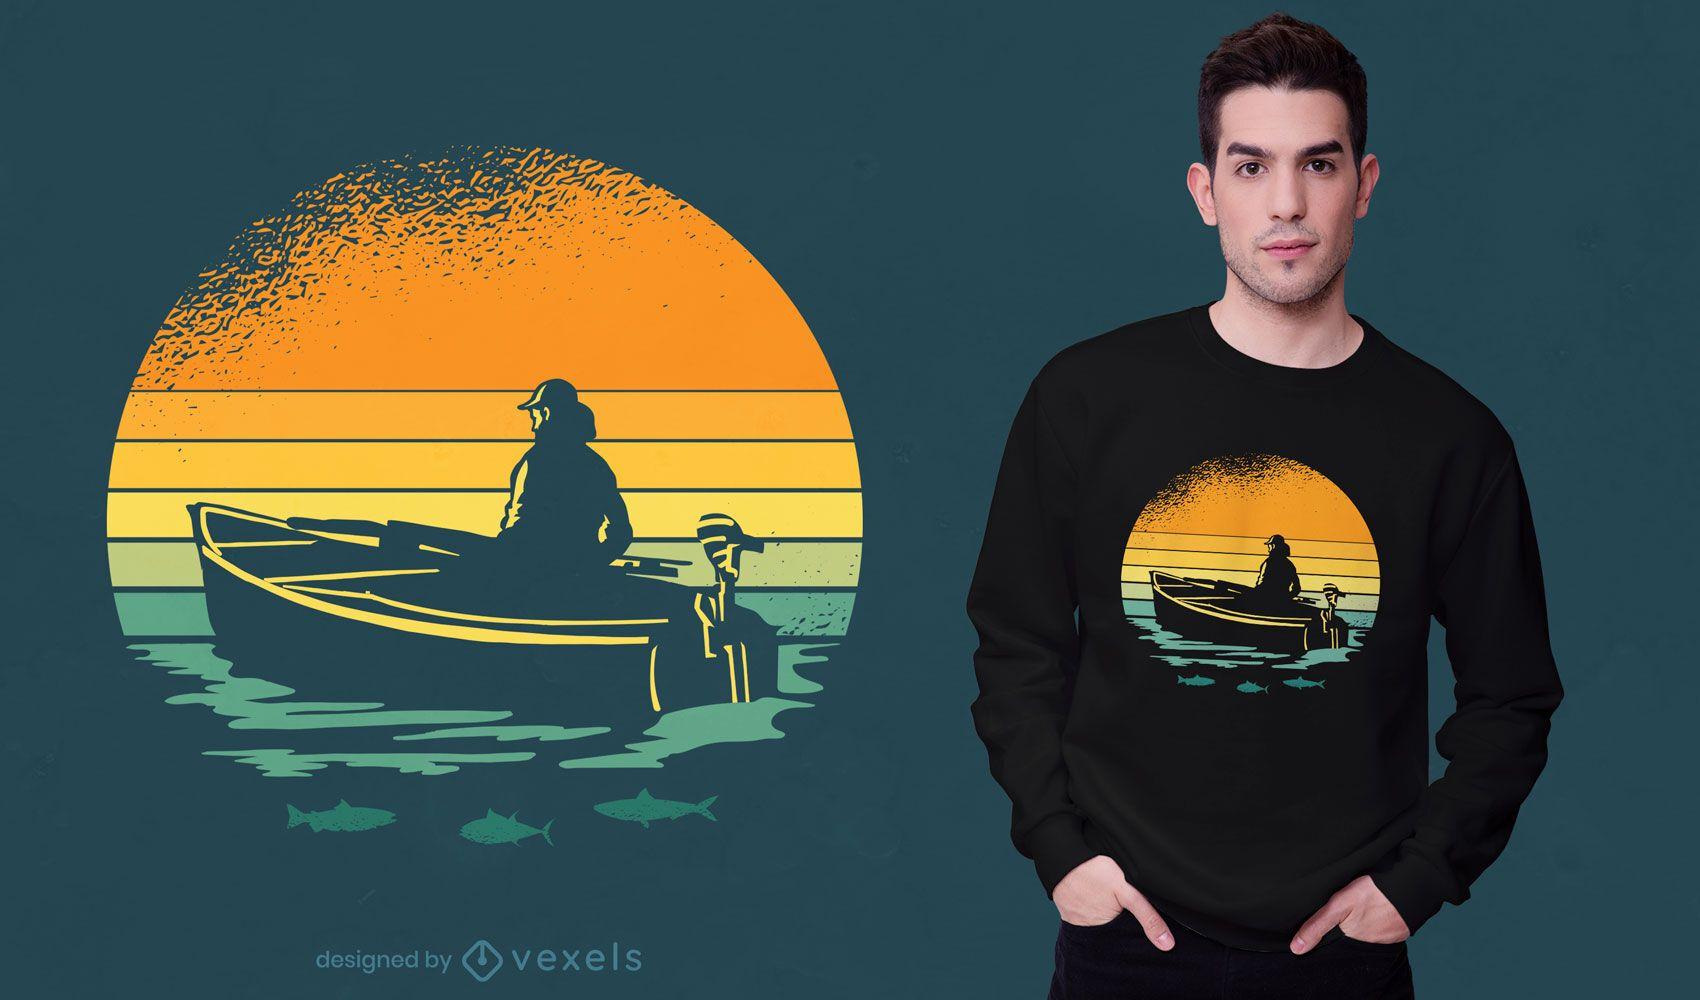 Diseño retro de camiseta de barco al atardecer